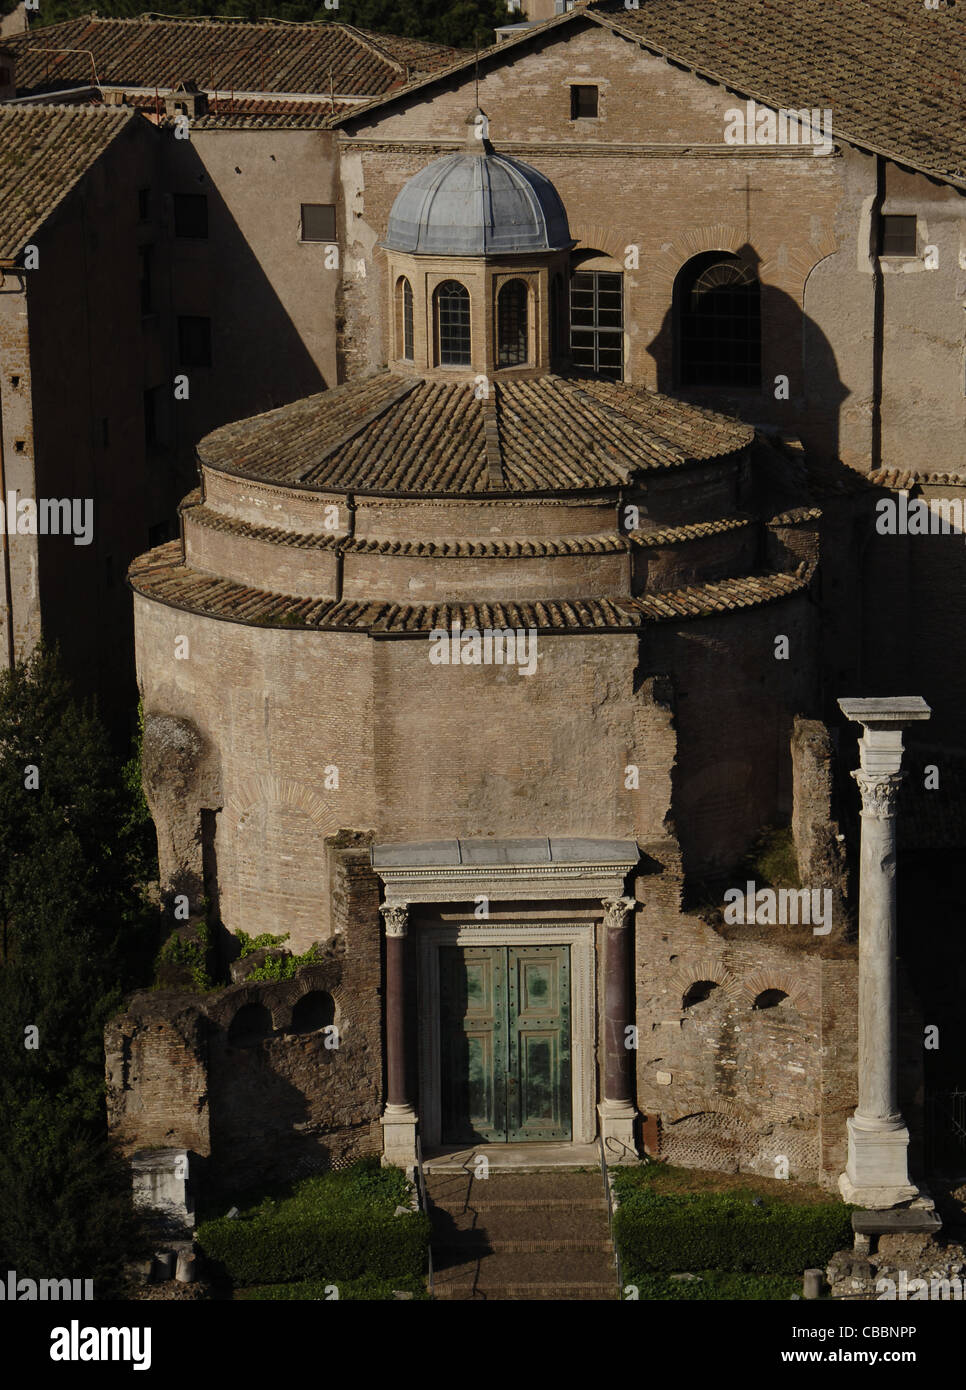 Italy. Rome. Temple of Romulus. Exterior. Roman Forum. - Stock Image